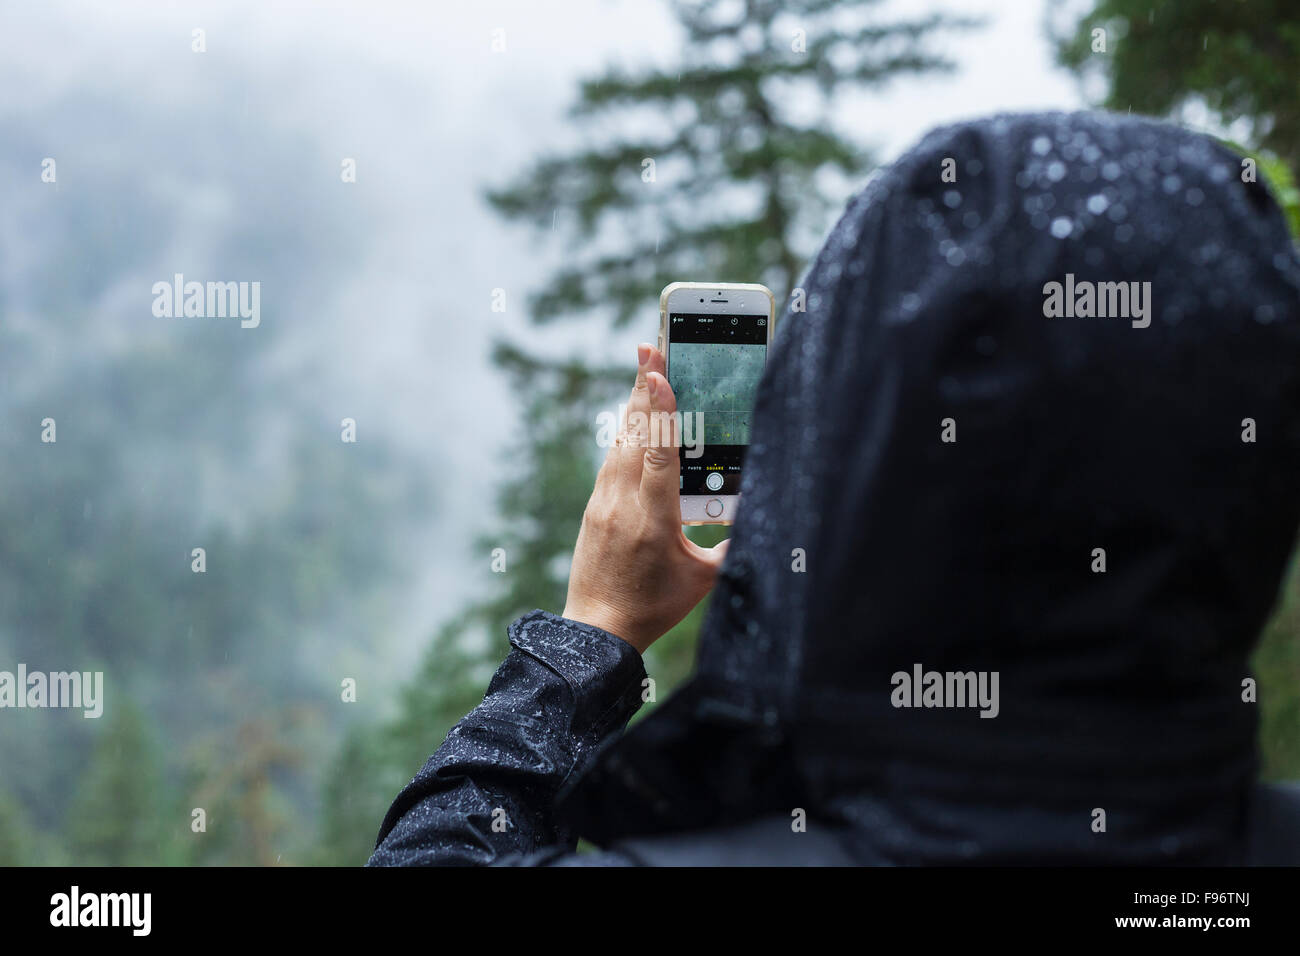 Mulher tirar foto na chuva, BC, Canadá Imagens de Stock